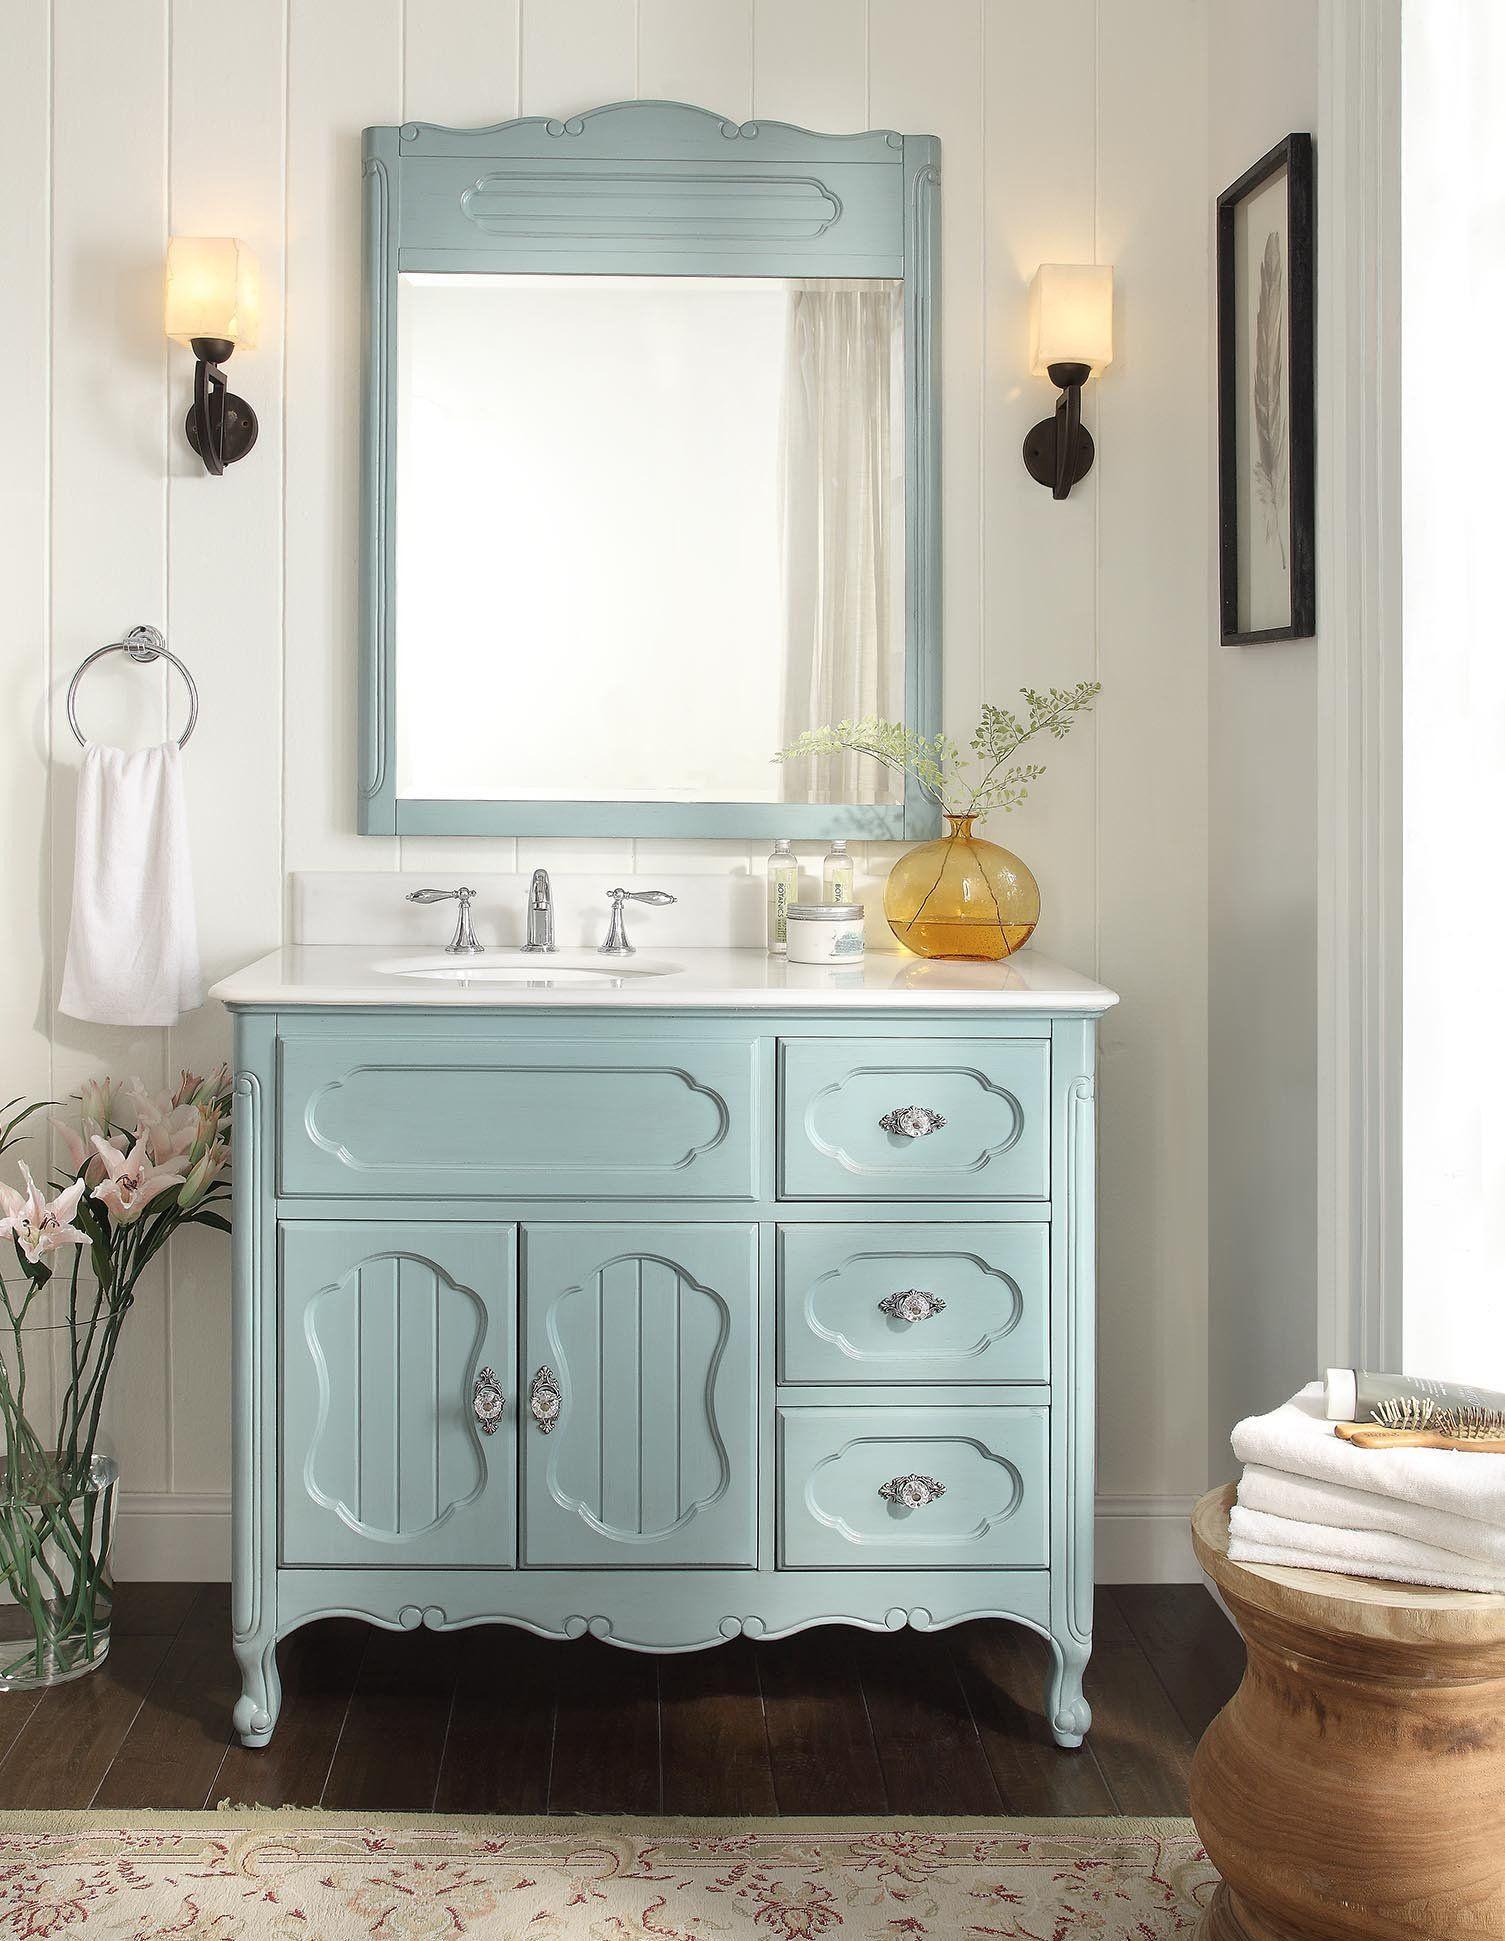 42 Benton Collection Victorian Cottage Style Knoxville Bathroom Vanity With Mirror Gd 1509bu Mir French Cottage Bathroom Cottage Bathroom Inspiration Shabby Chic Bathroom